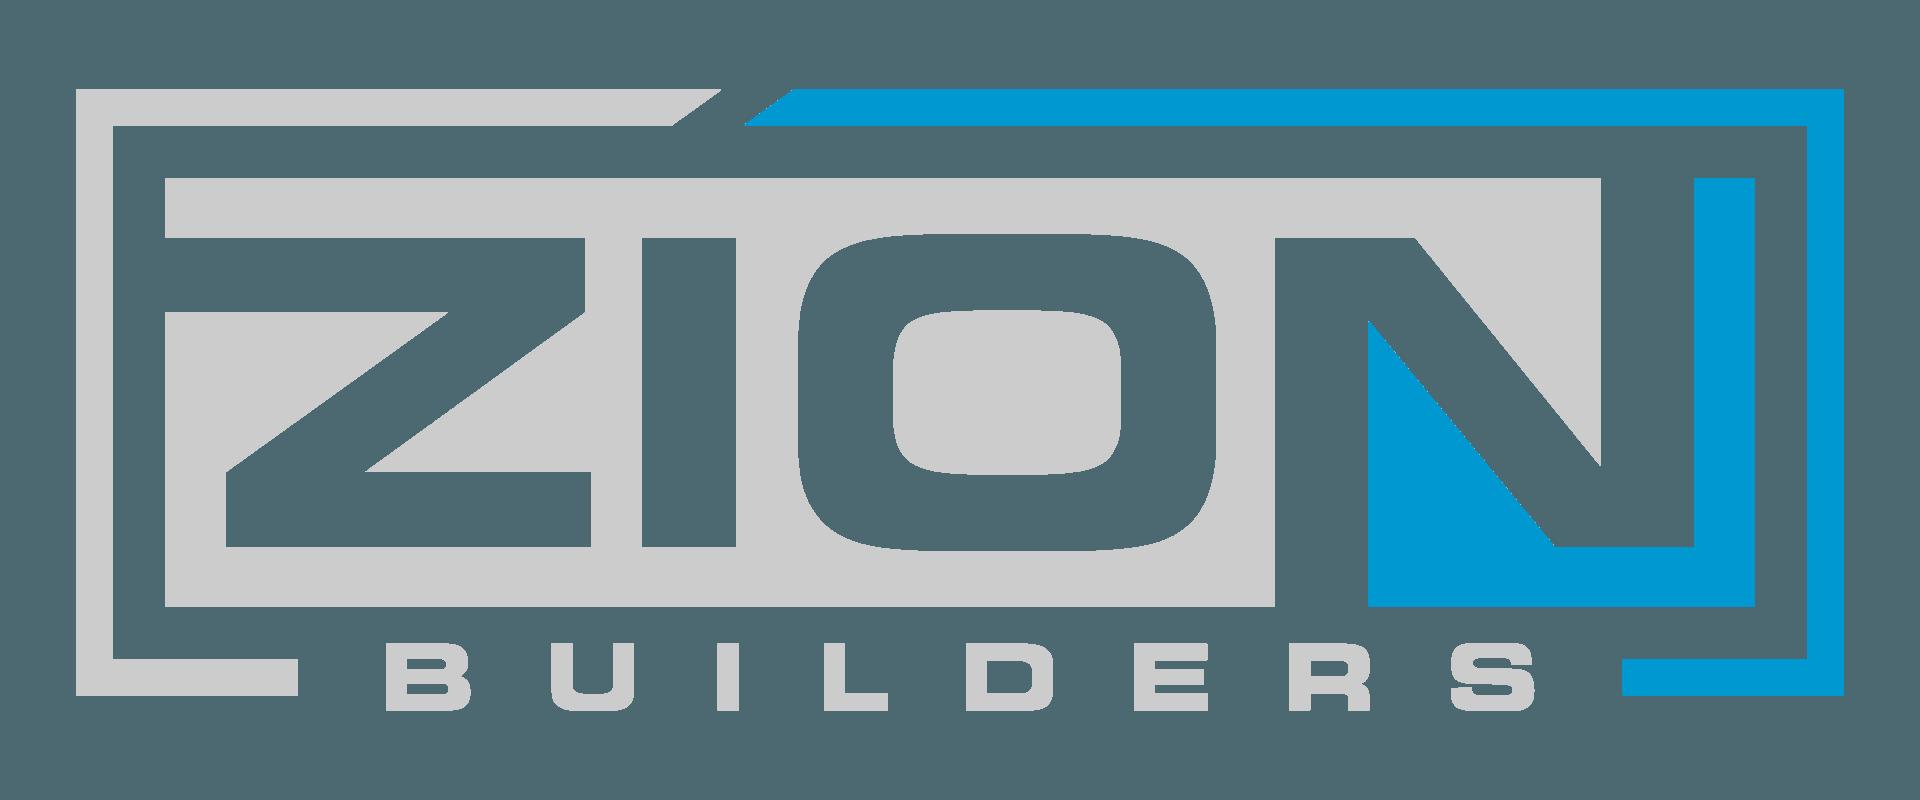 Zion Builders logo